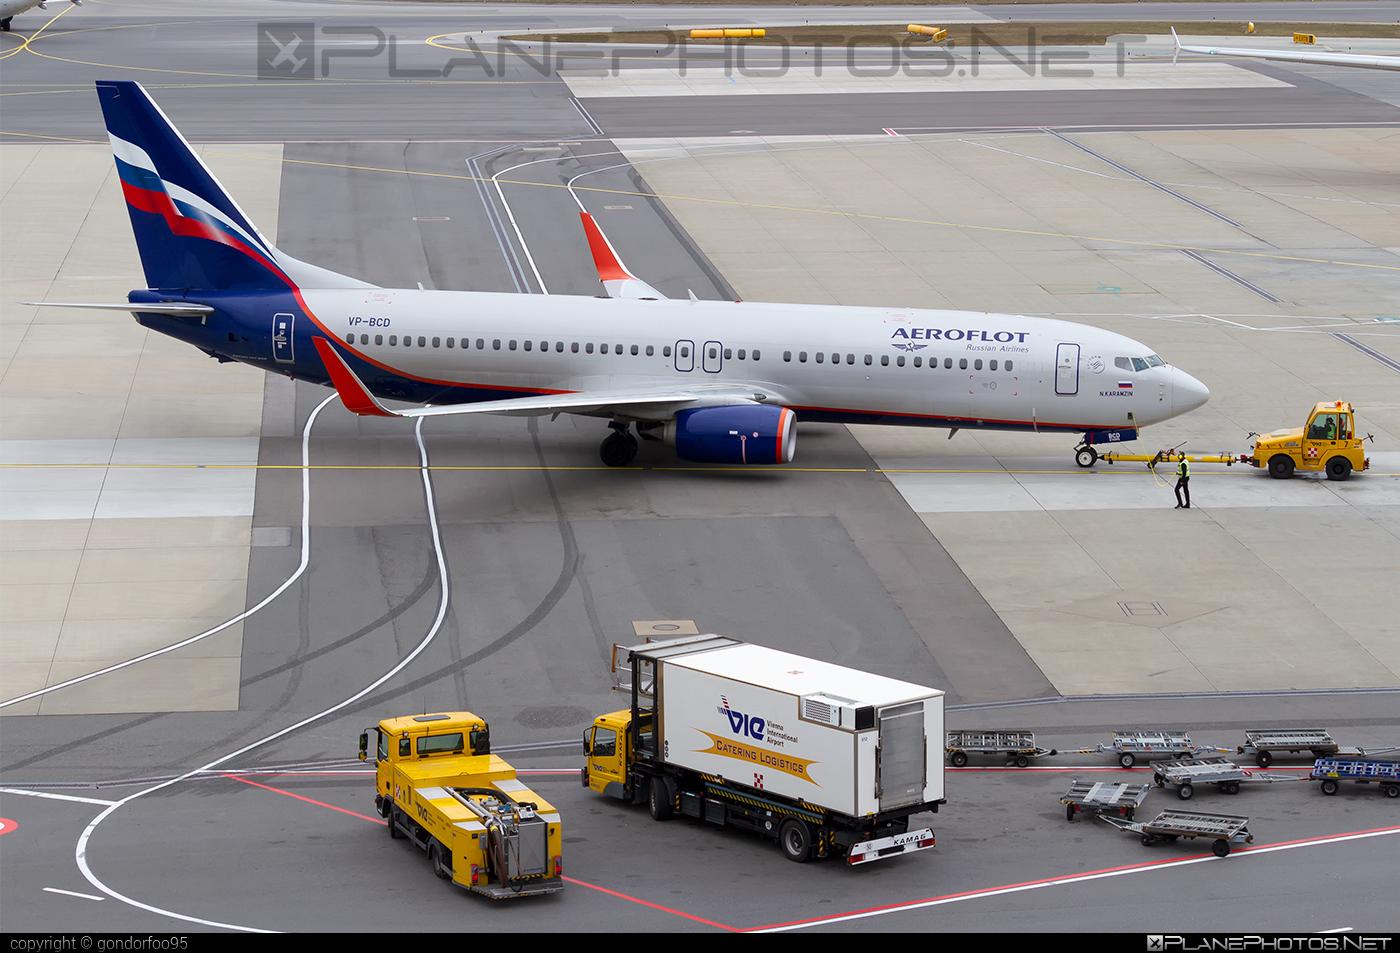 Boeing 737-800 - VP-BCD operated by Aeroflot #aeroflot #b737 #b737nextgen #b737ng #boeing #boeing737